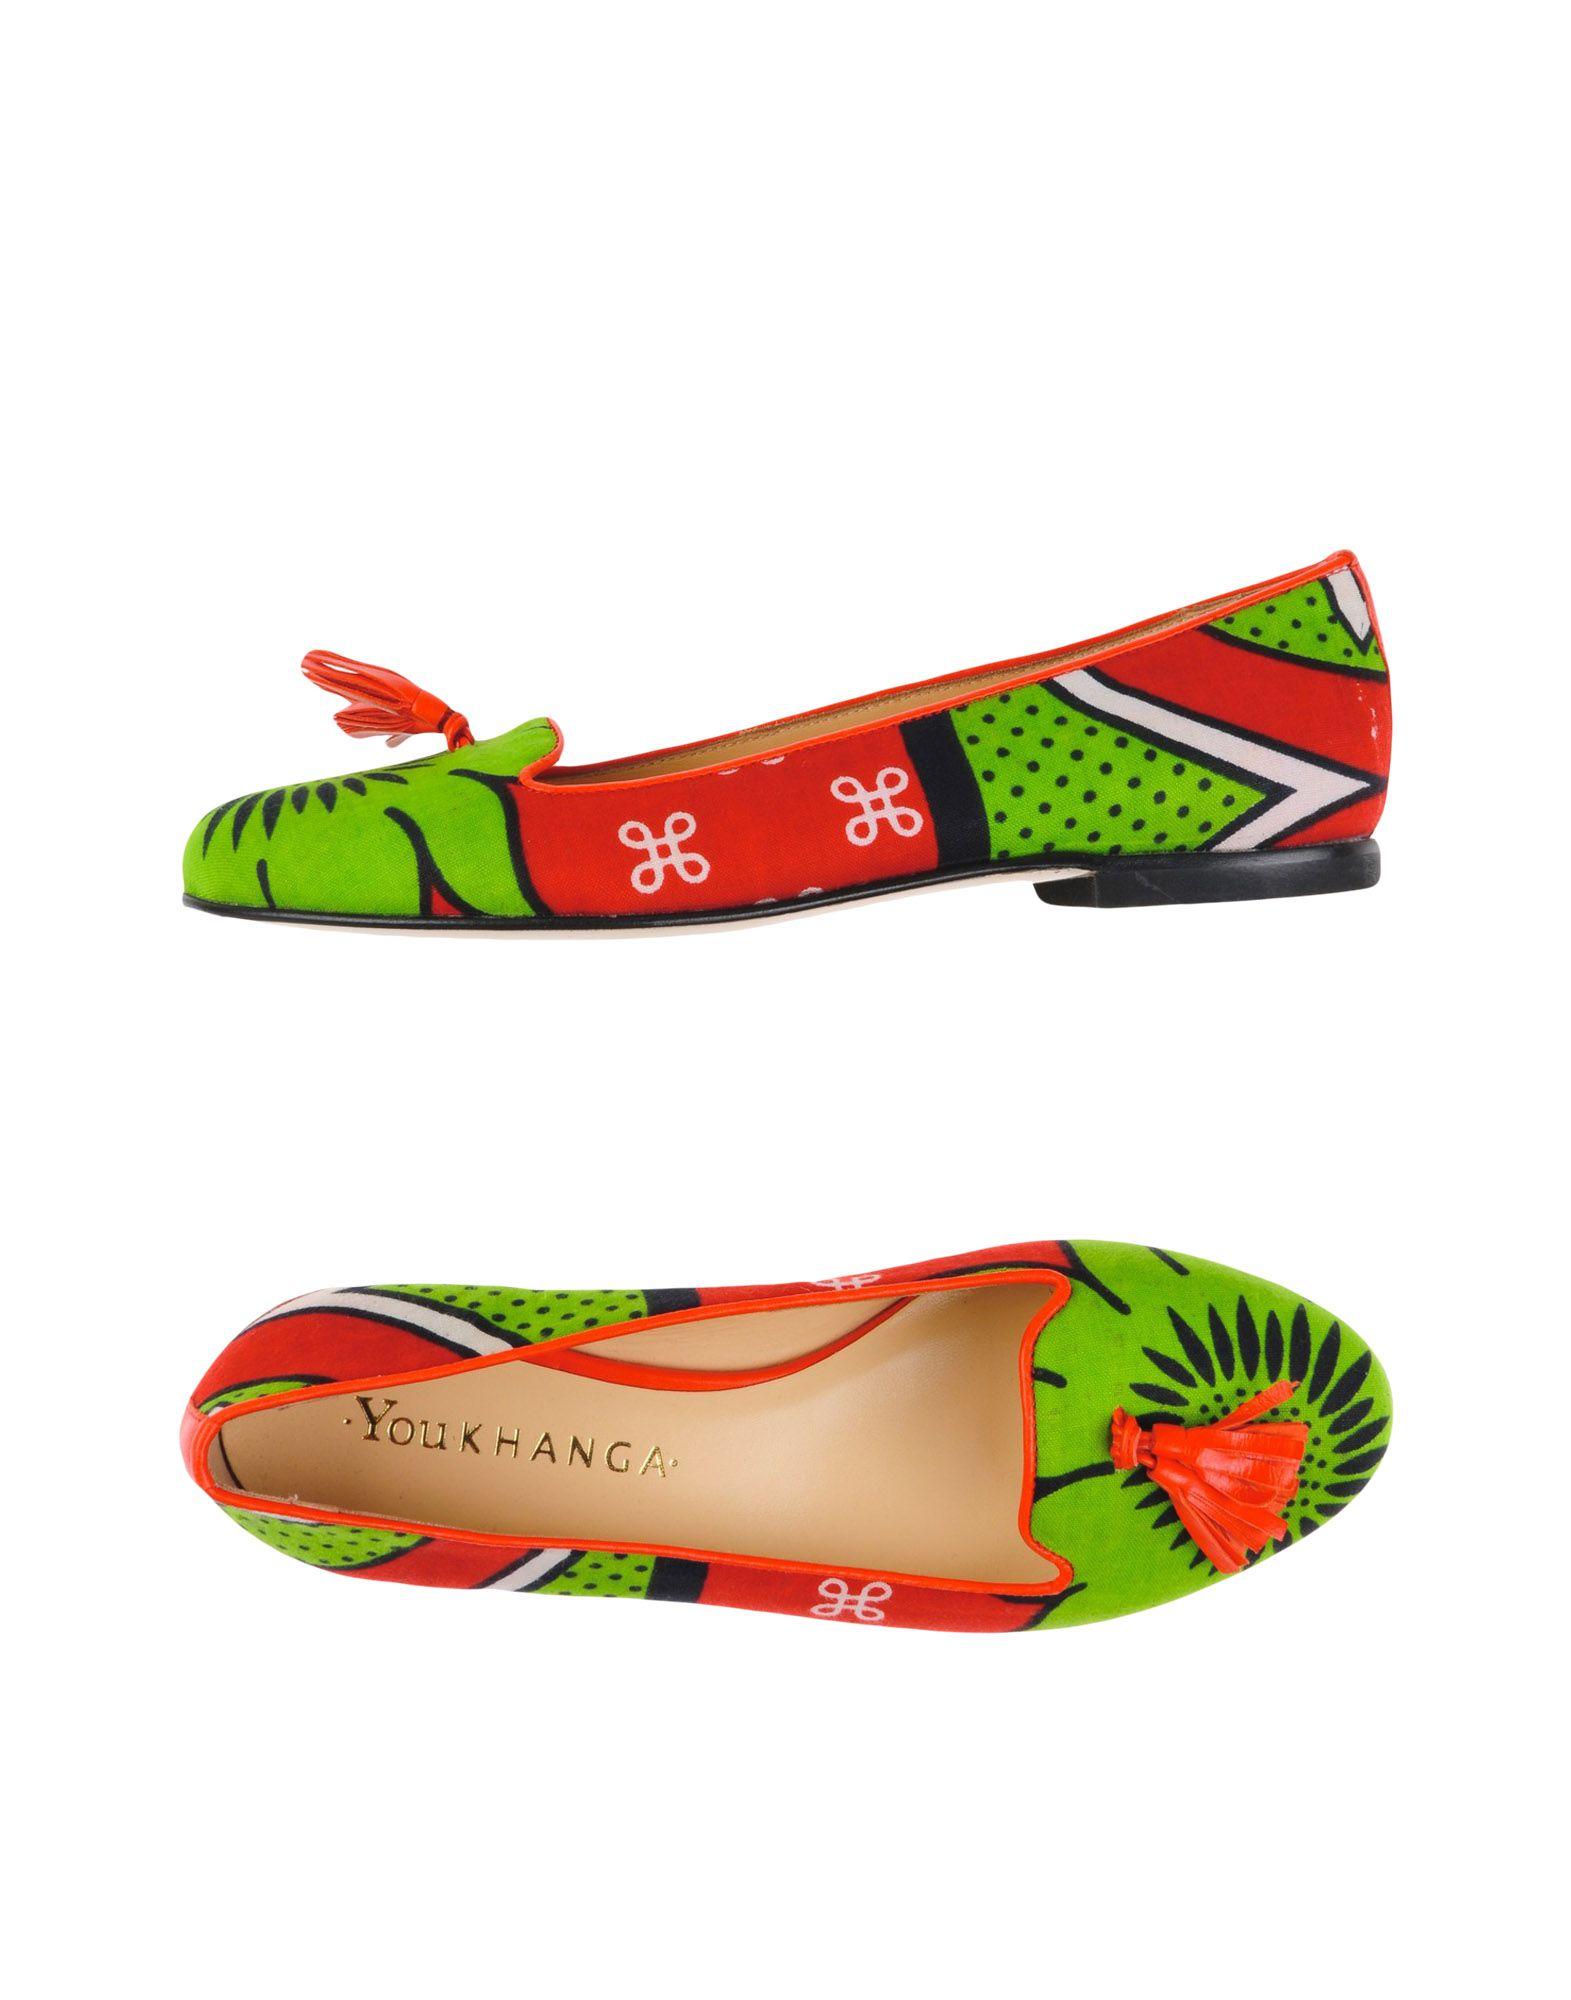 YOU KHANGA Loafers in Light Green